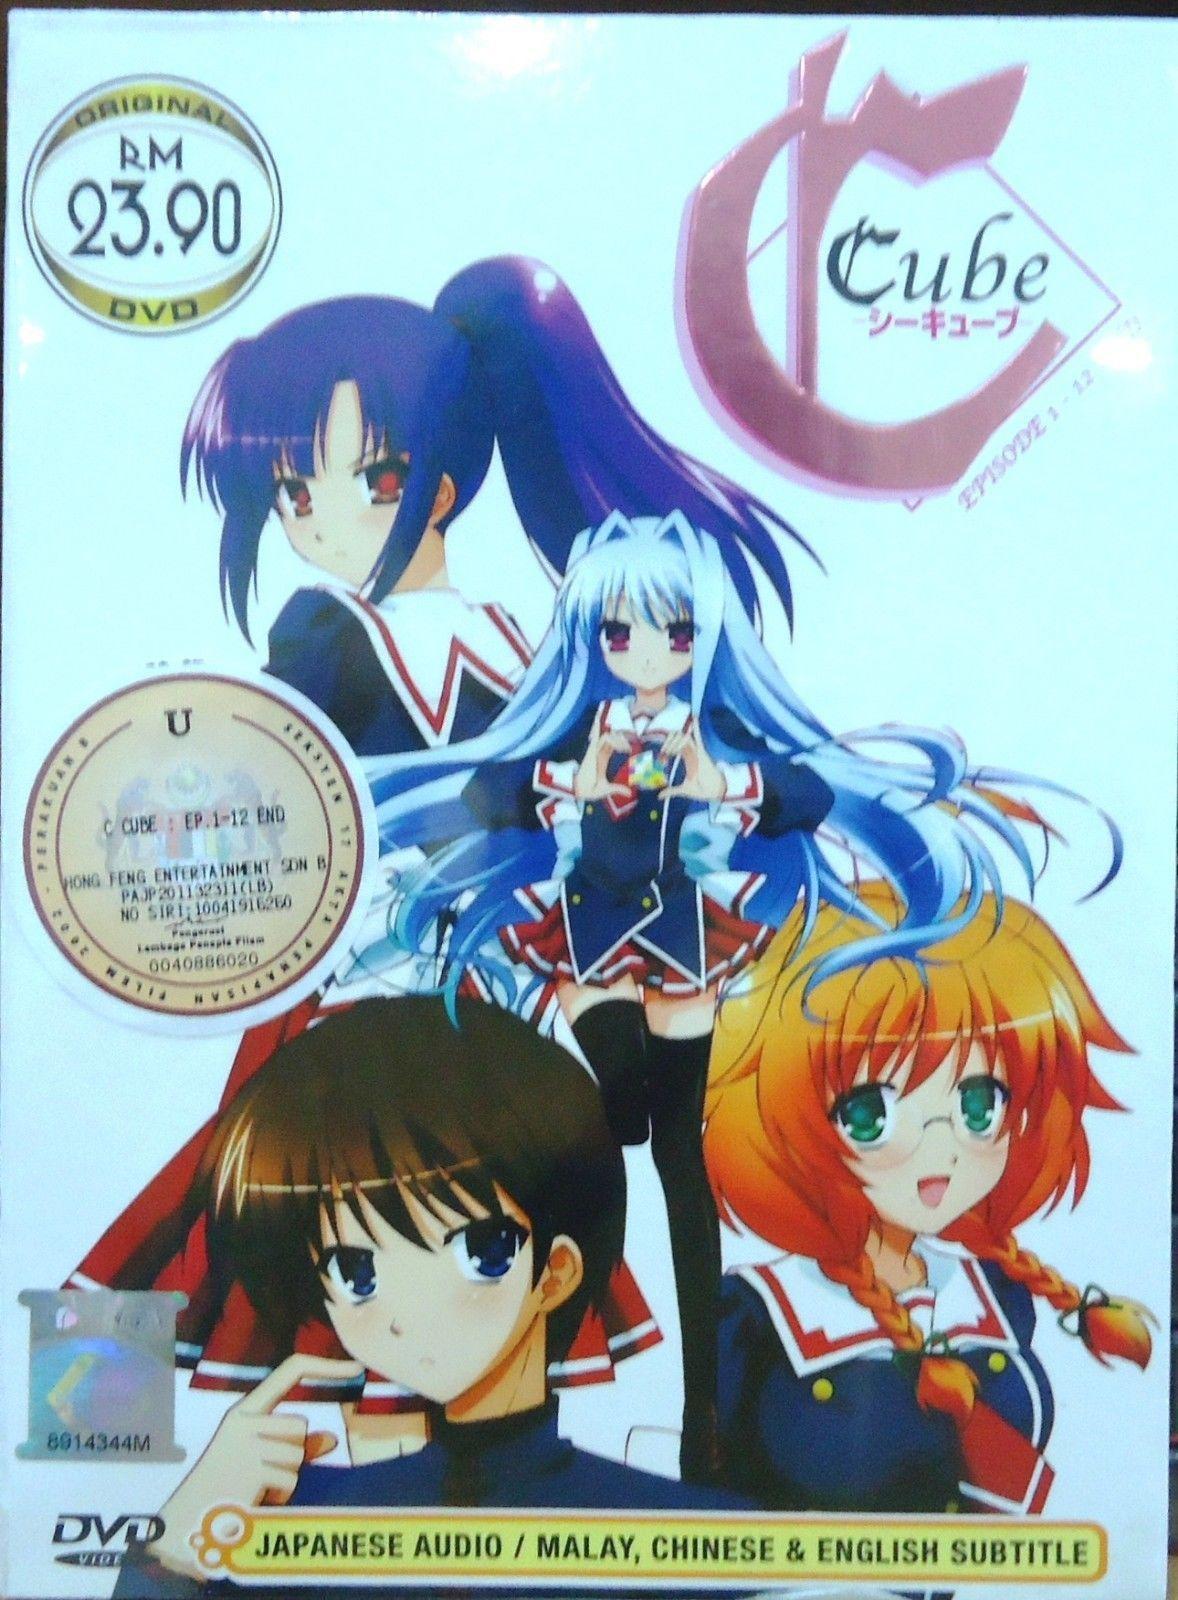 Pin By Jaime On C Cube Anime Anime Dvd Fan Art